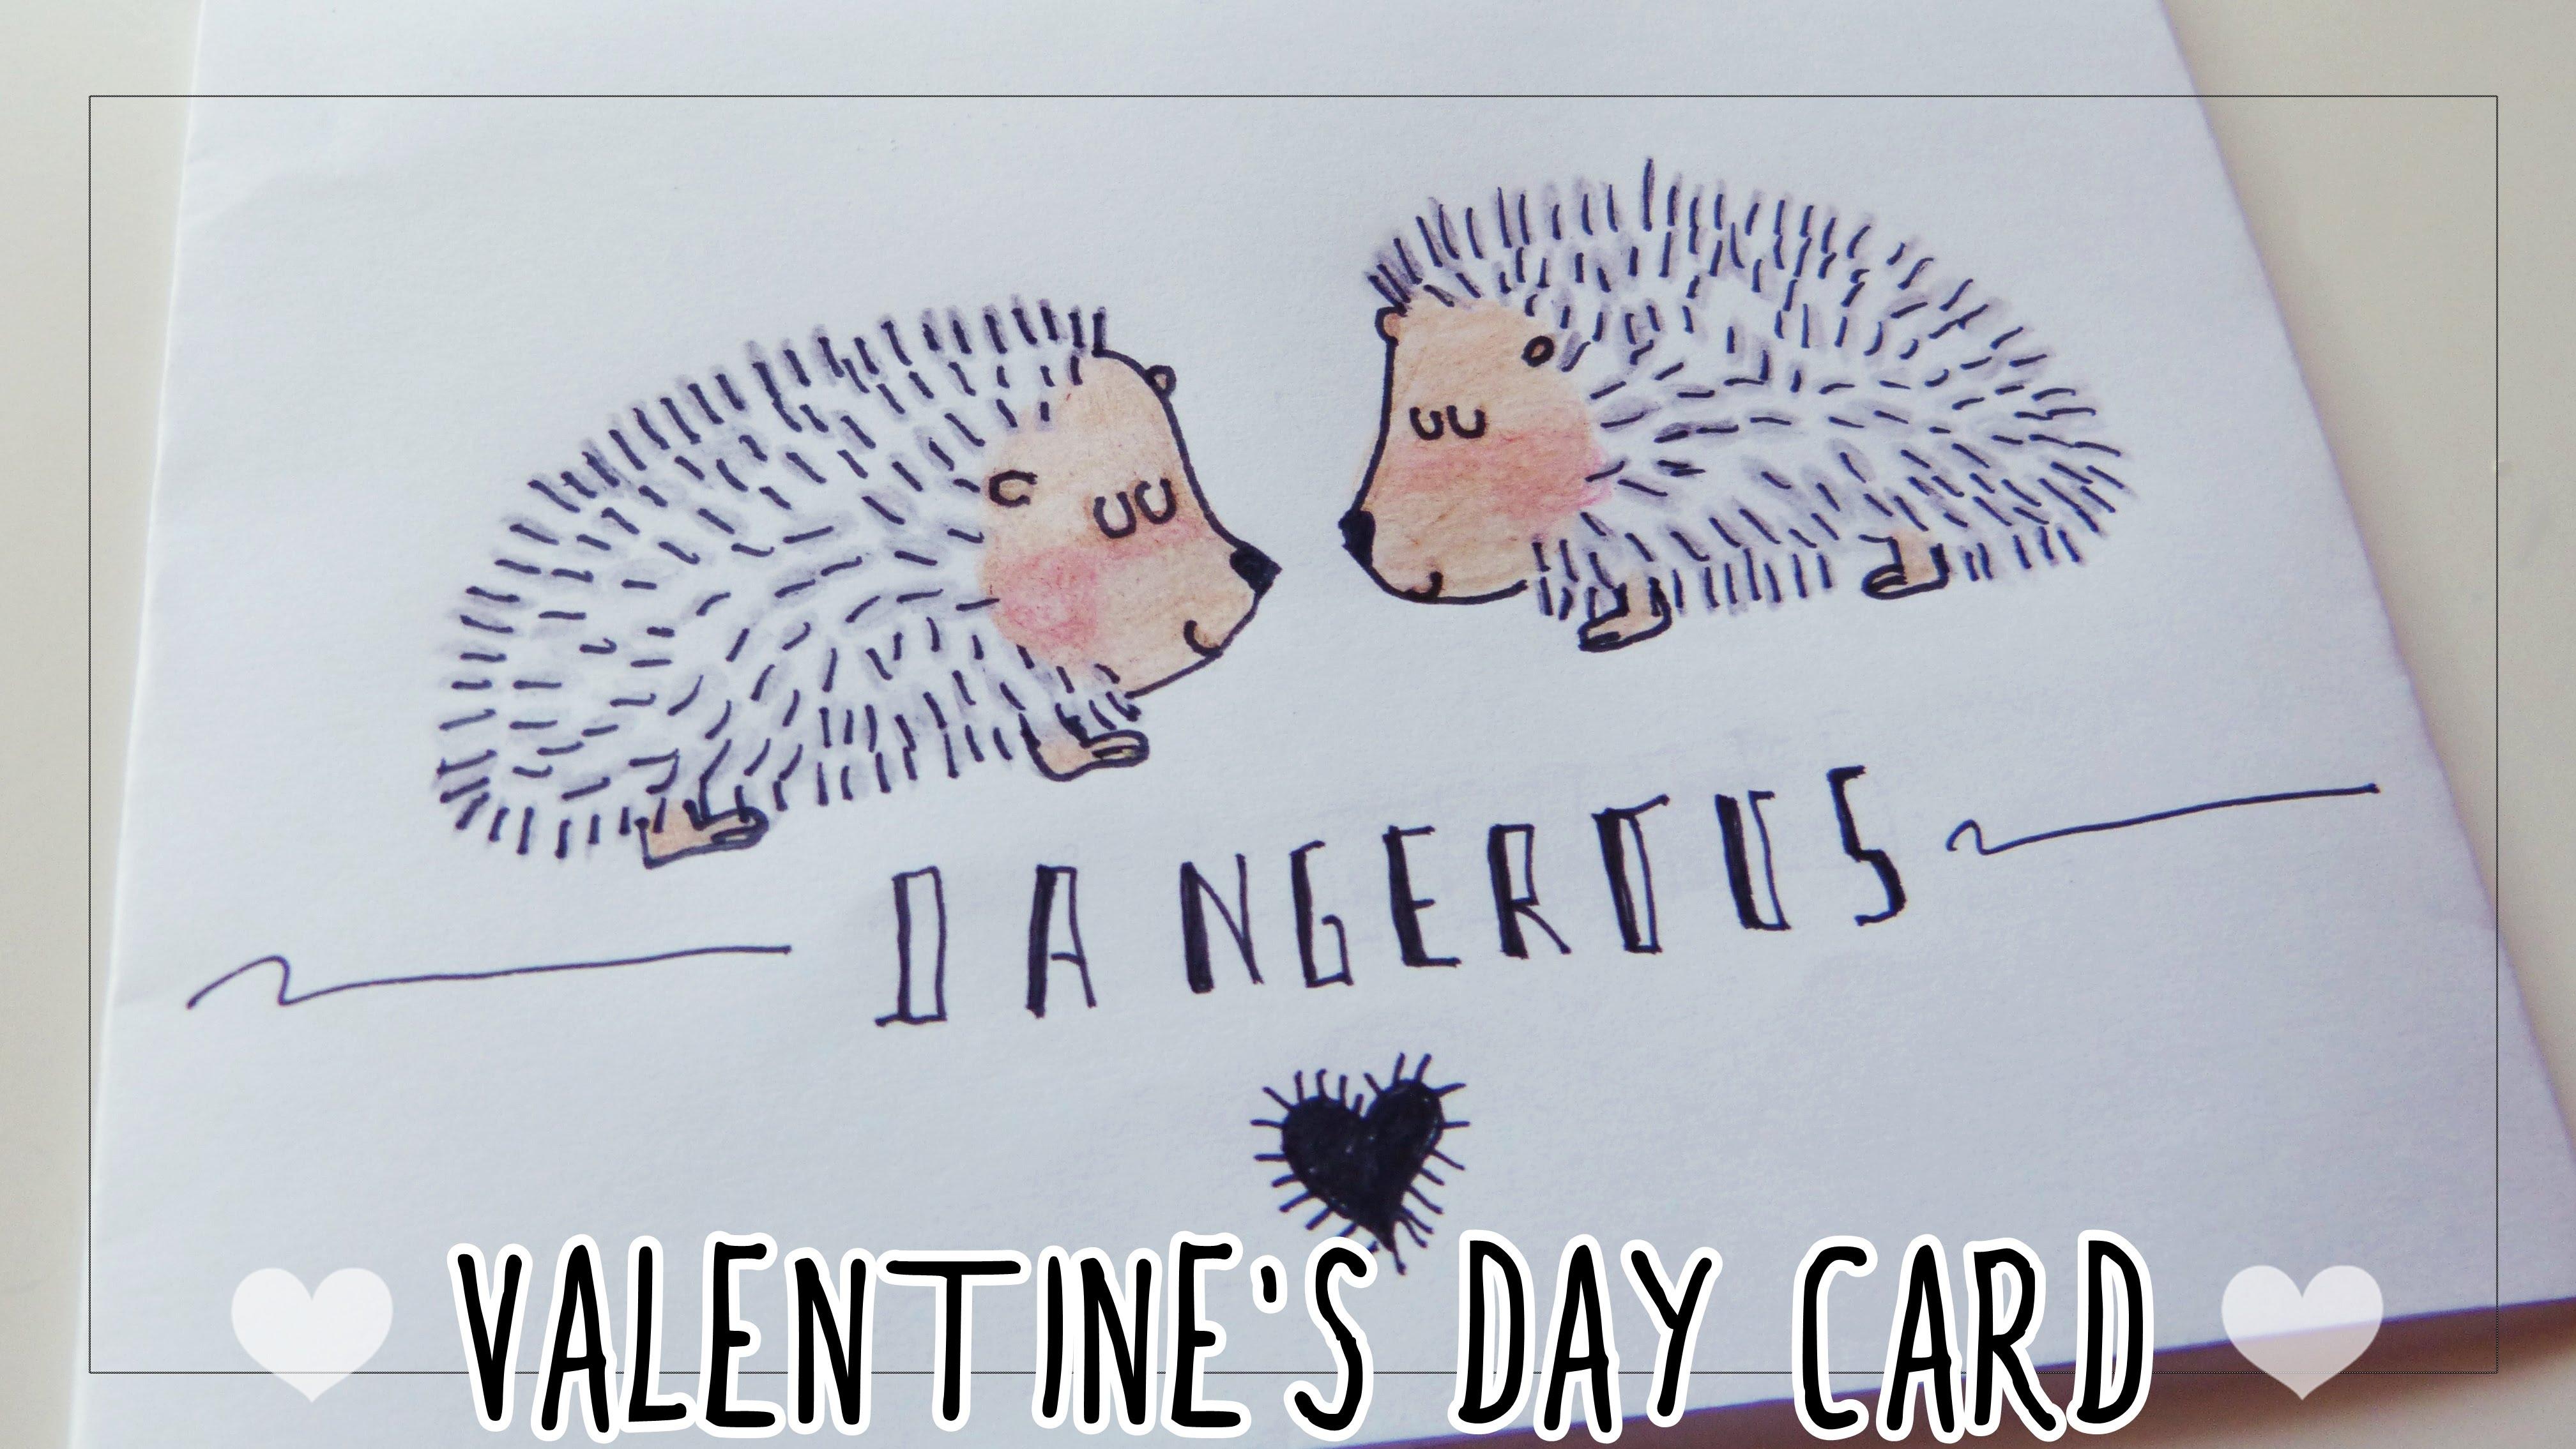 4033x2269 Valentine's Day Card For Boyfriend Drawing Hedgehogs